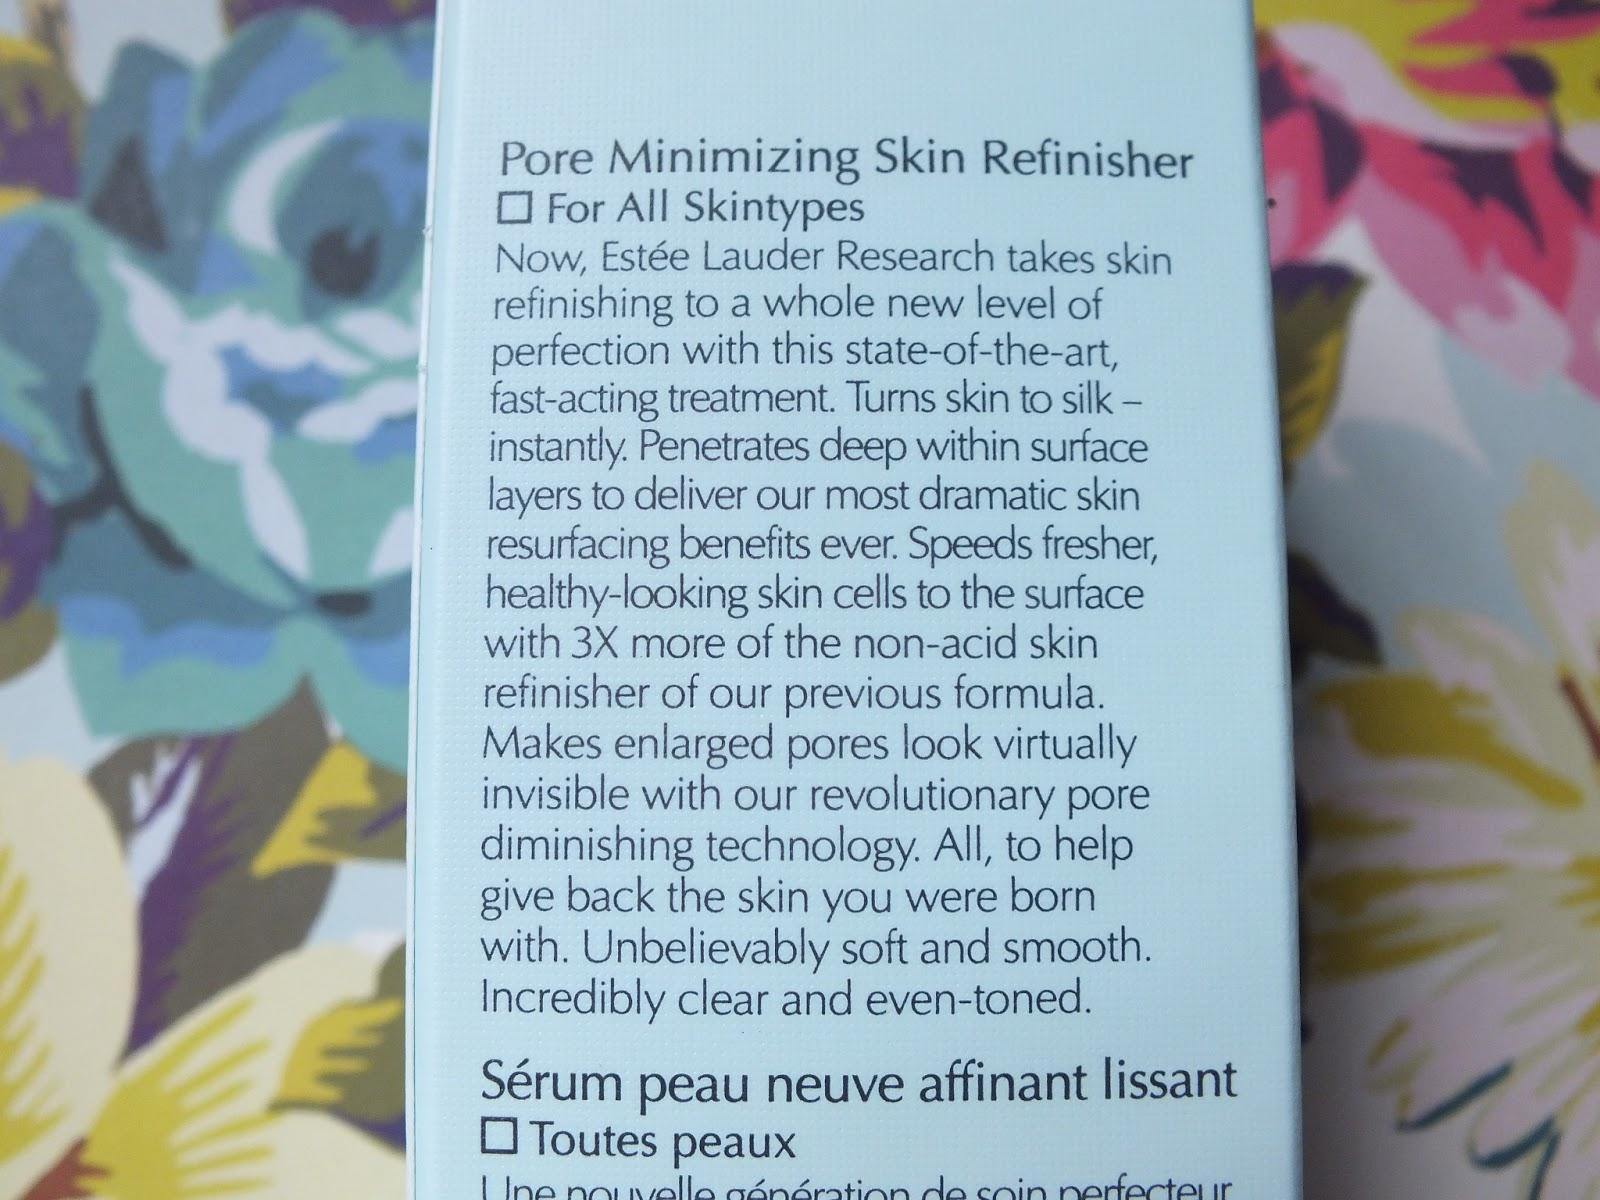 Idealist Pore Minimizing Skin Refinisher by Estée Lauder #20